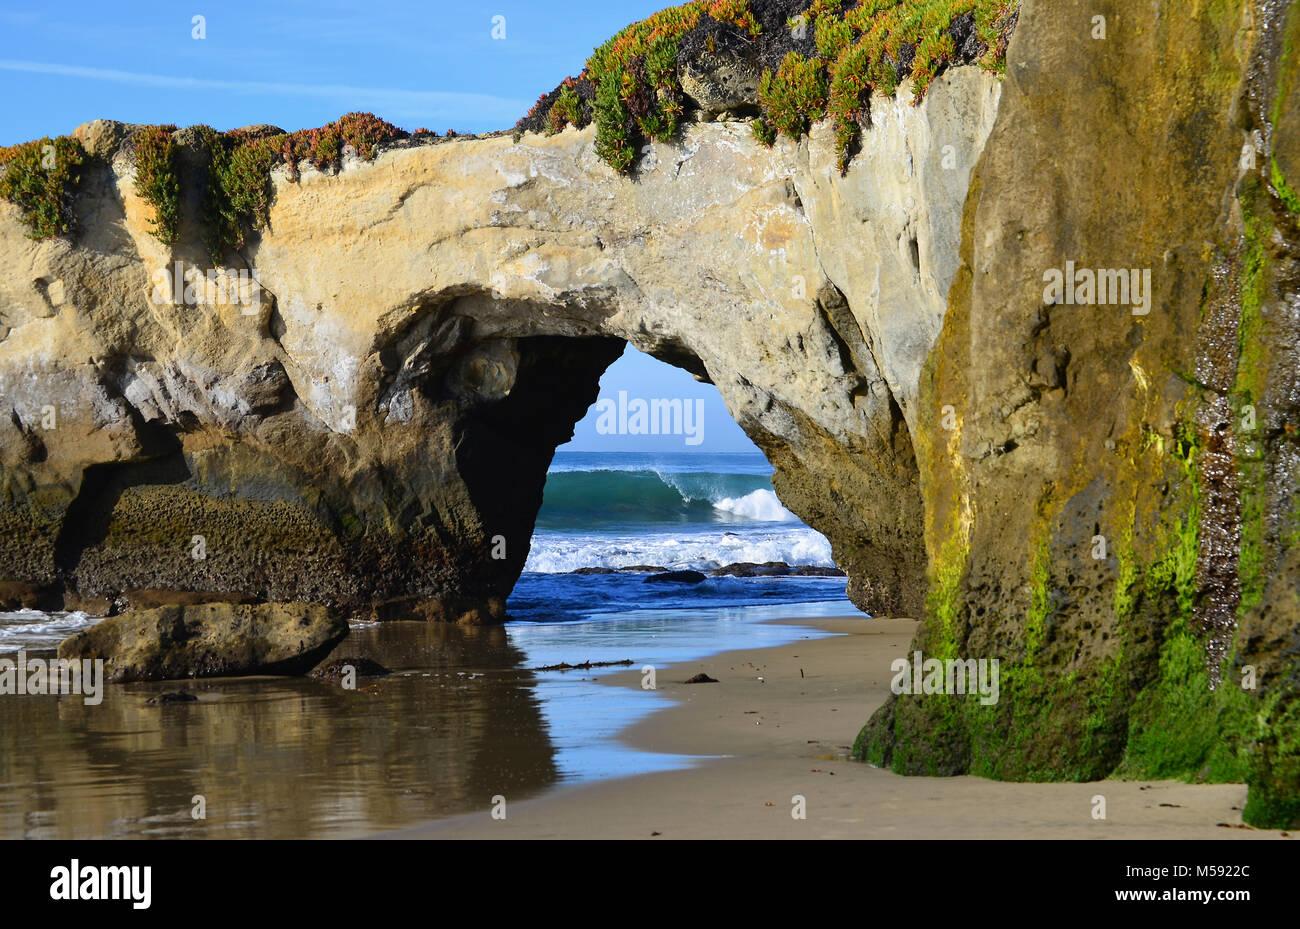 Natural bridge on Westcliff Drive in Santa Cruz, California - Stock Image